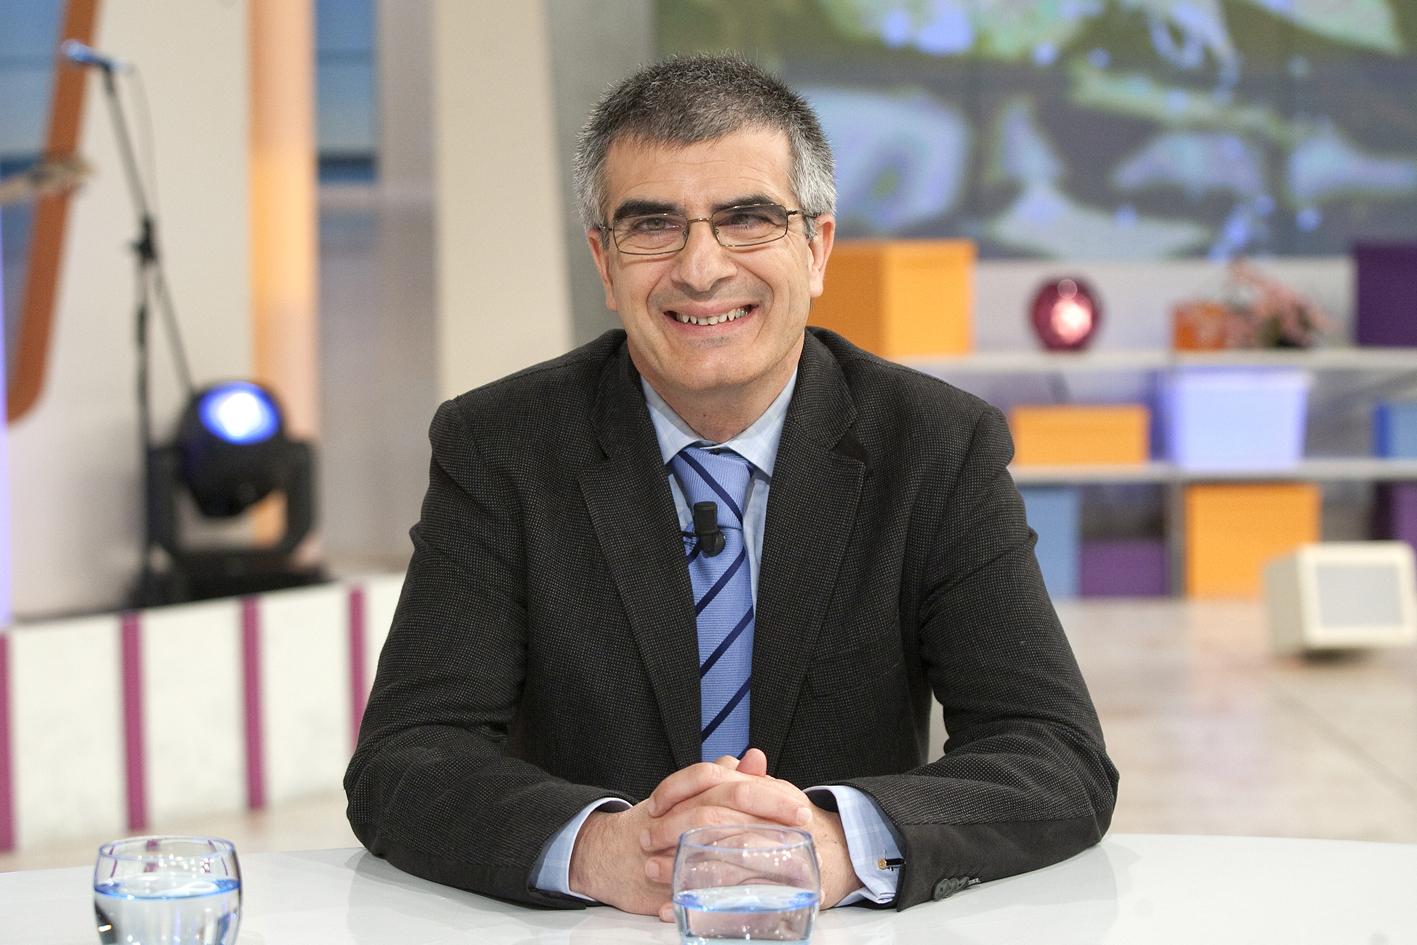 Dr. Salvador Díaz Lobato: